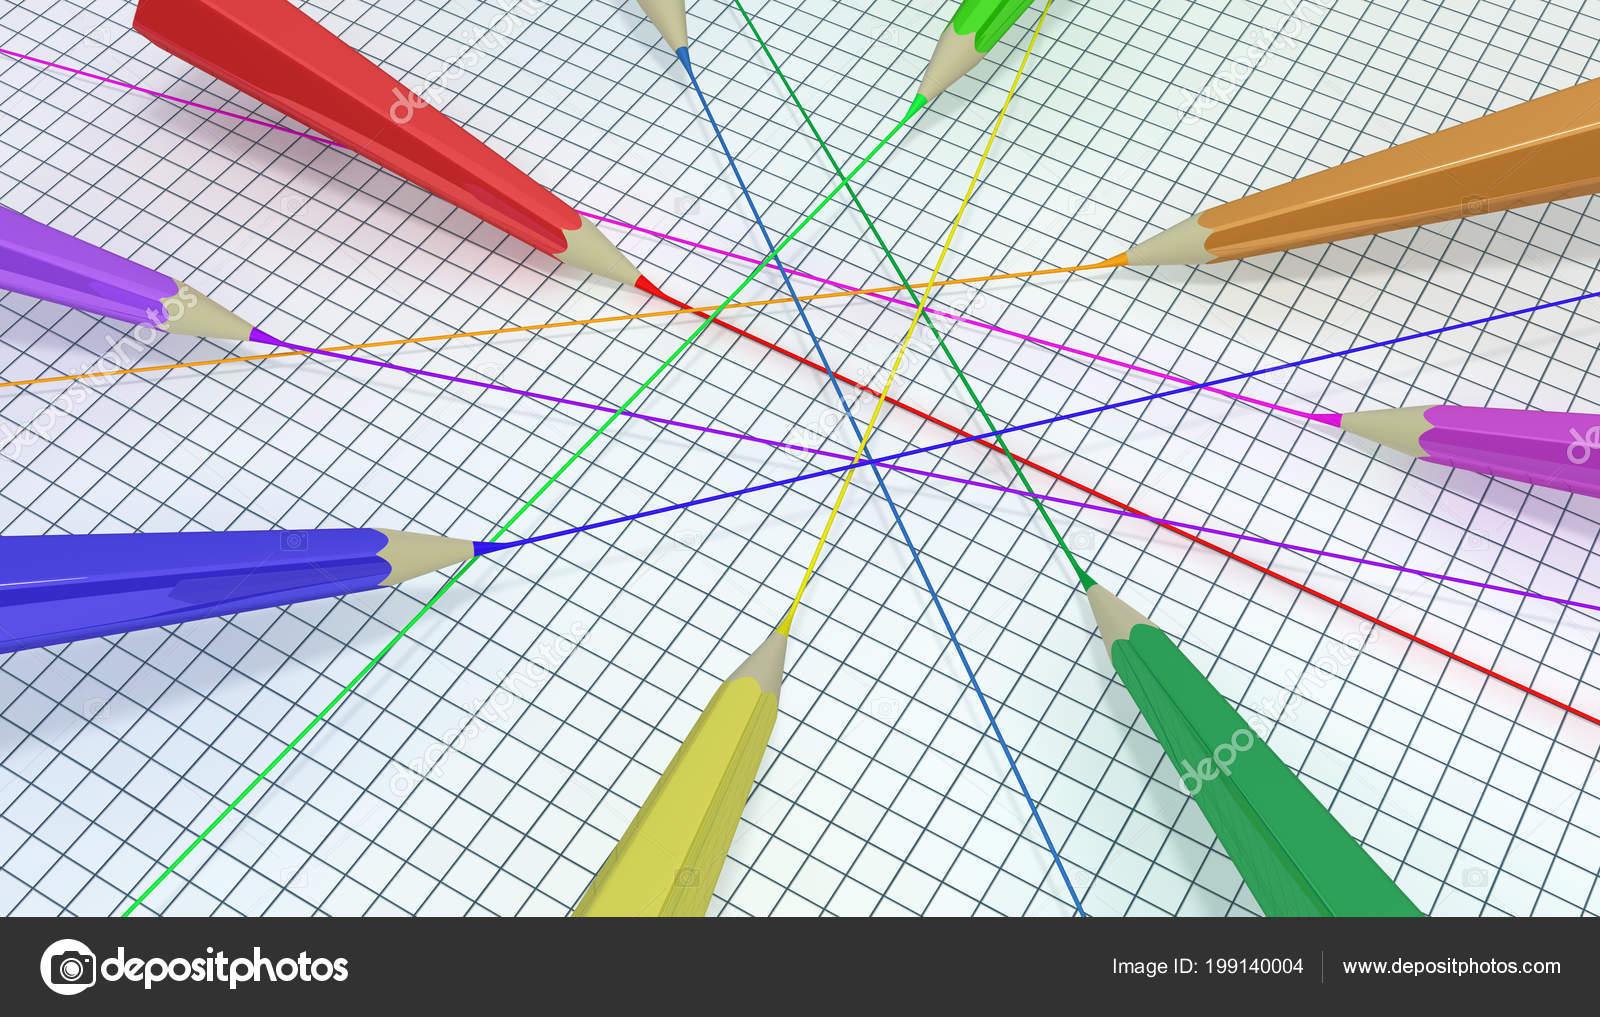 Color Arte Lápices Dibujo Líneas Rectas Ilustración Fondo Horizontal